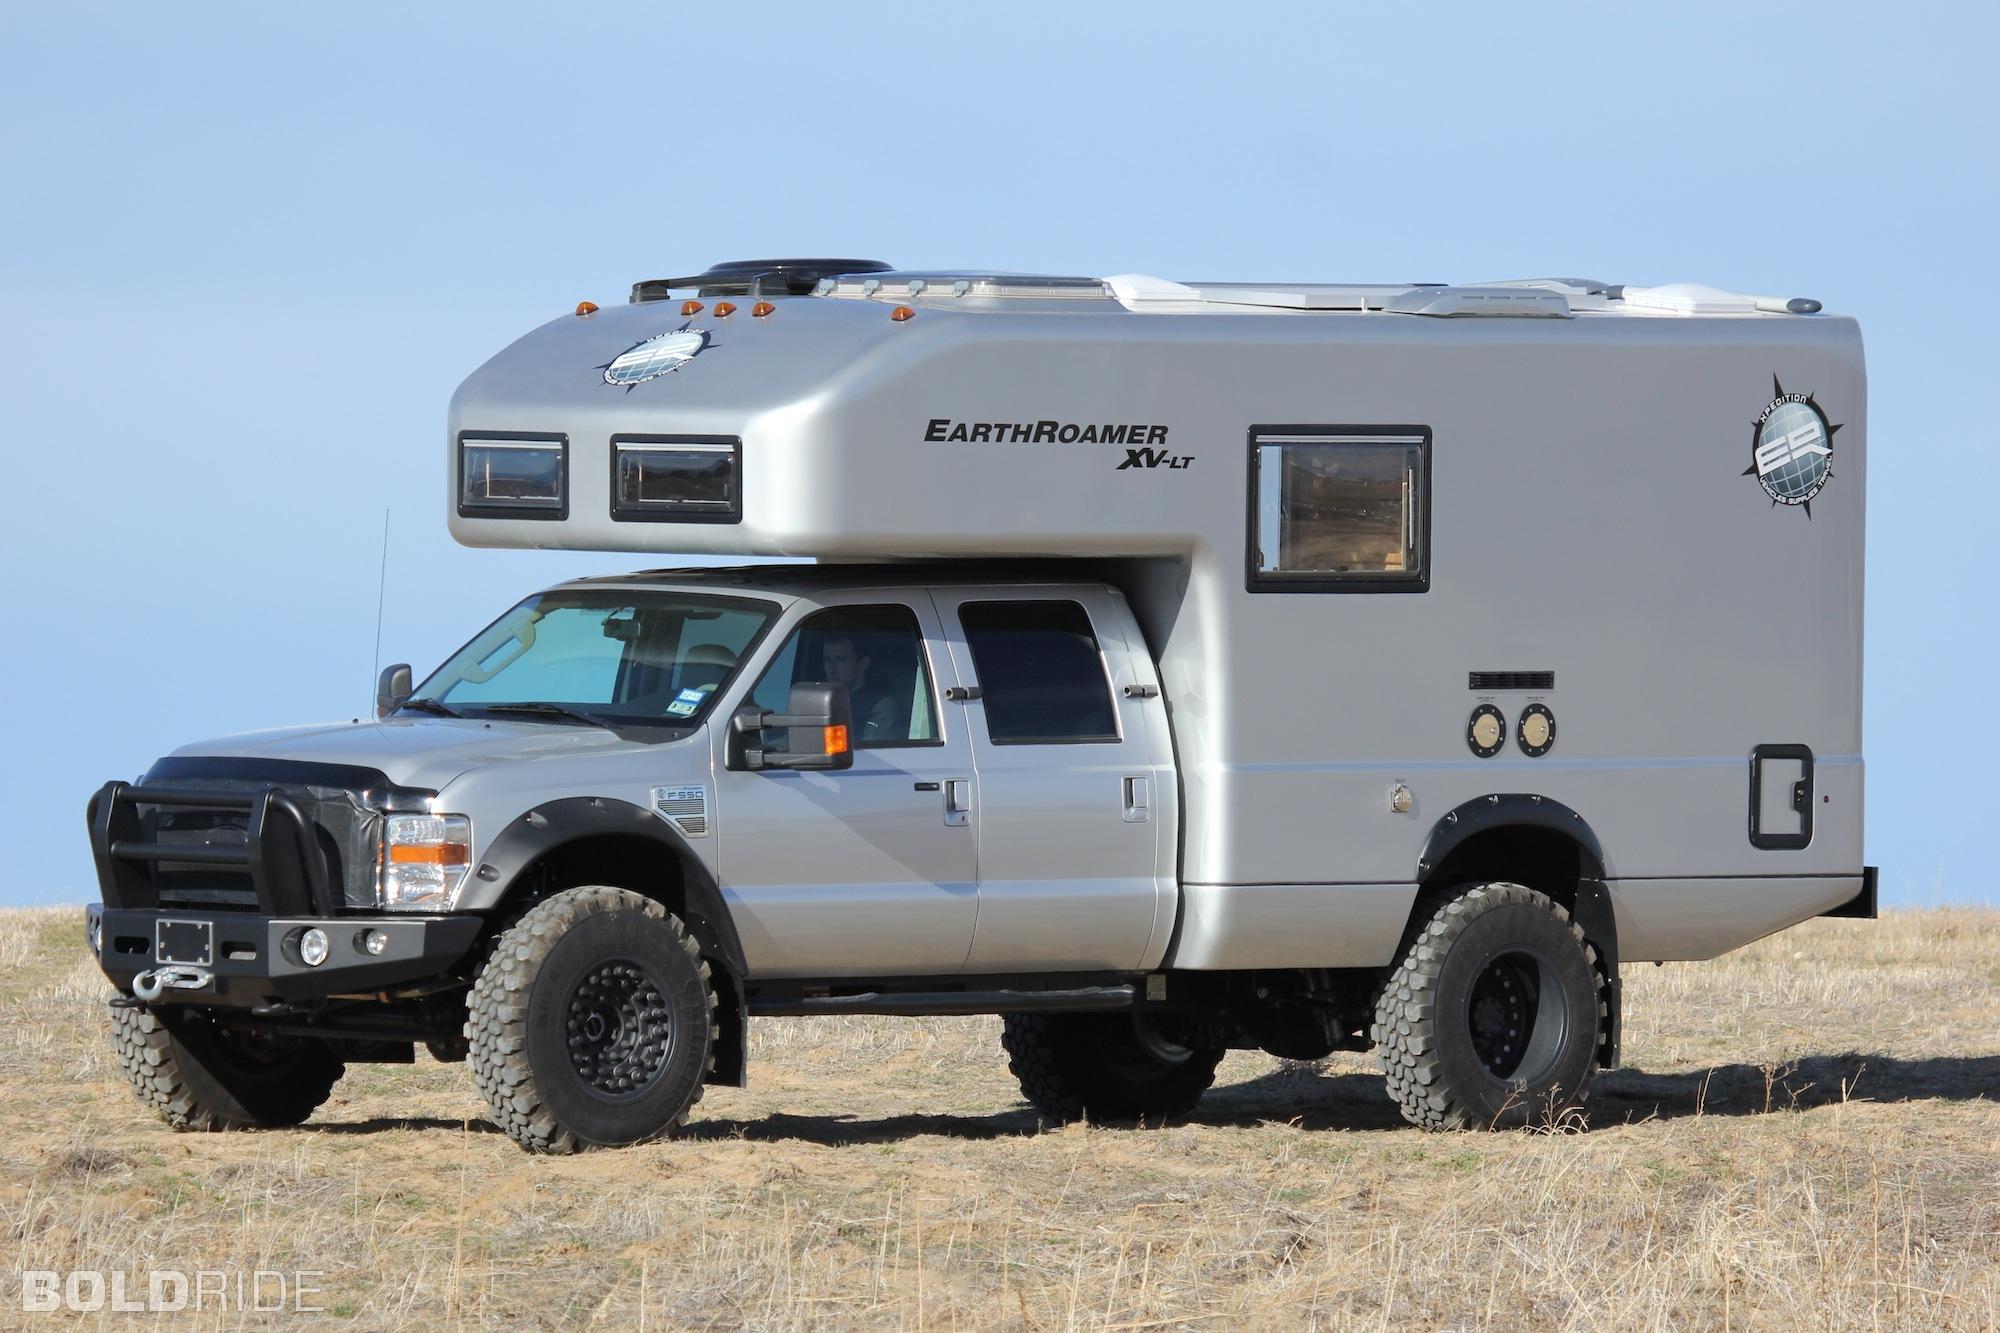 Chinook Rv Floor Plans 2013 Ford F 550 Xv Lt 4x4 Offroad Truck Camper S Wallpaper